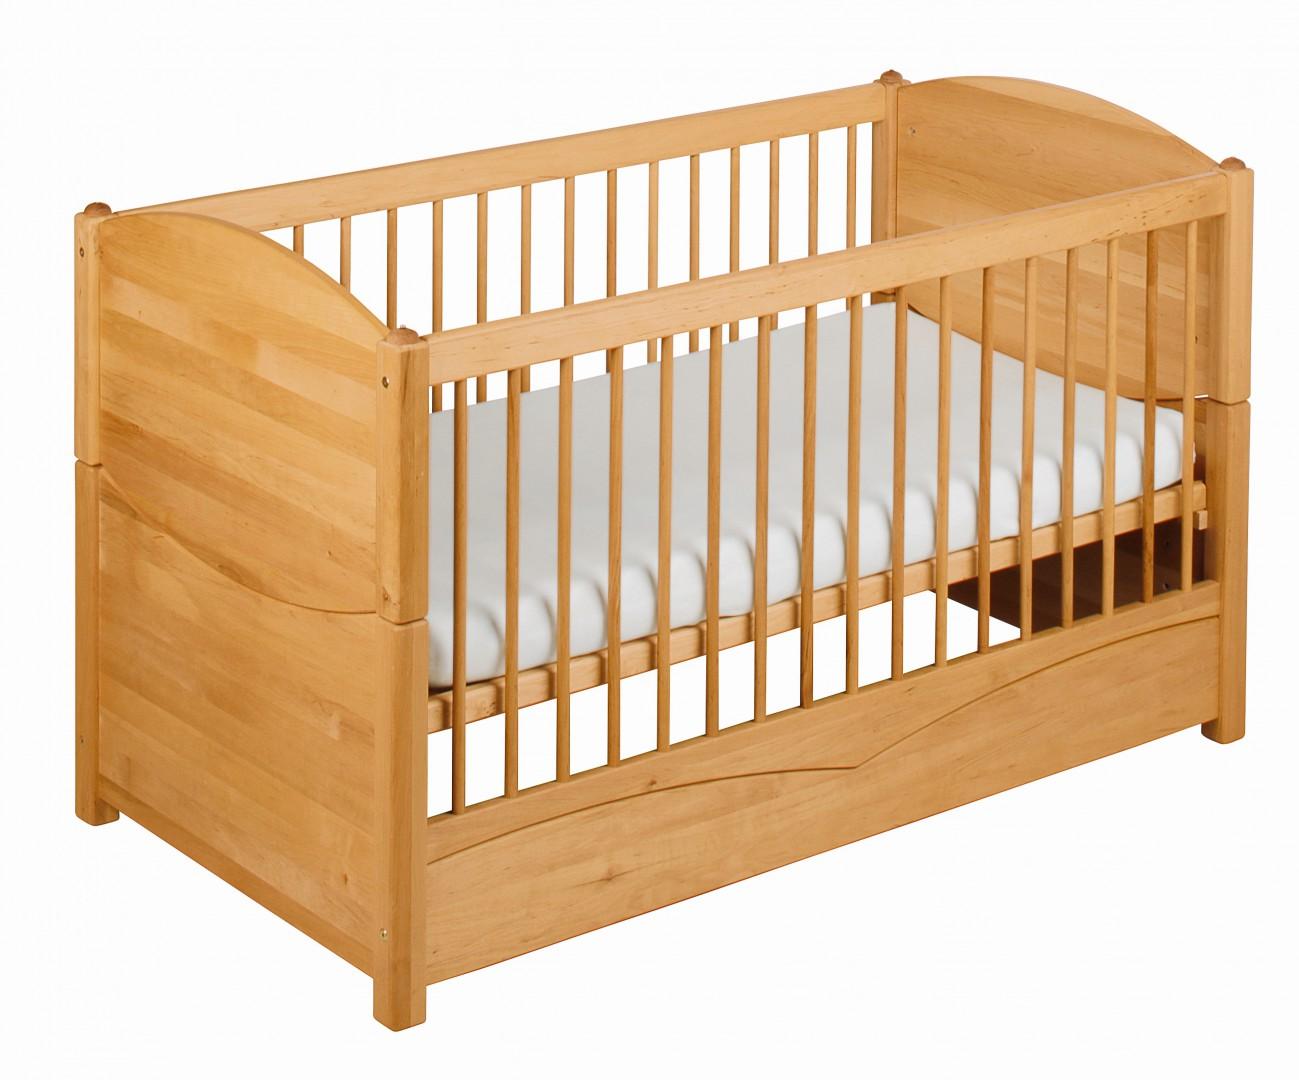 biokinder babybett kinderbett mit betthimmelhalter 70x140 bio massivholz erle ebay. Black Bedroom Furniture Sets. Home Design Ideas